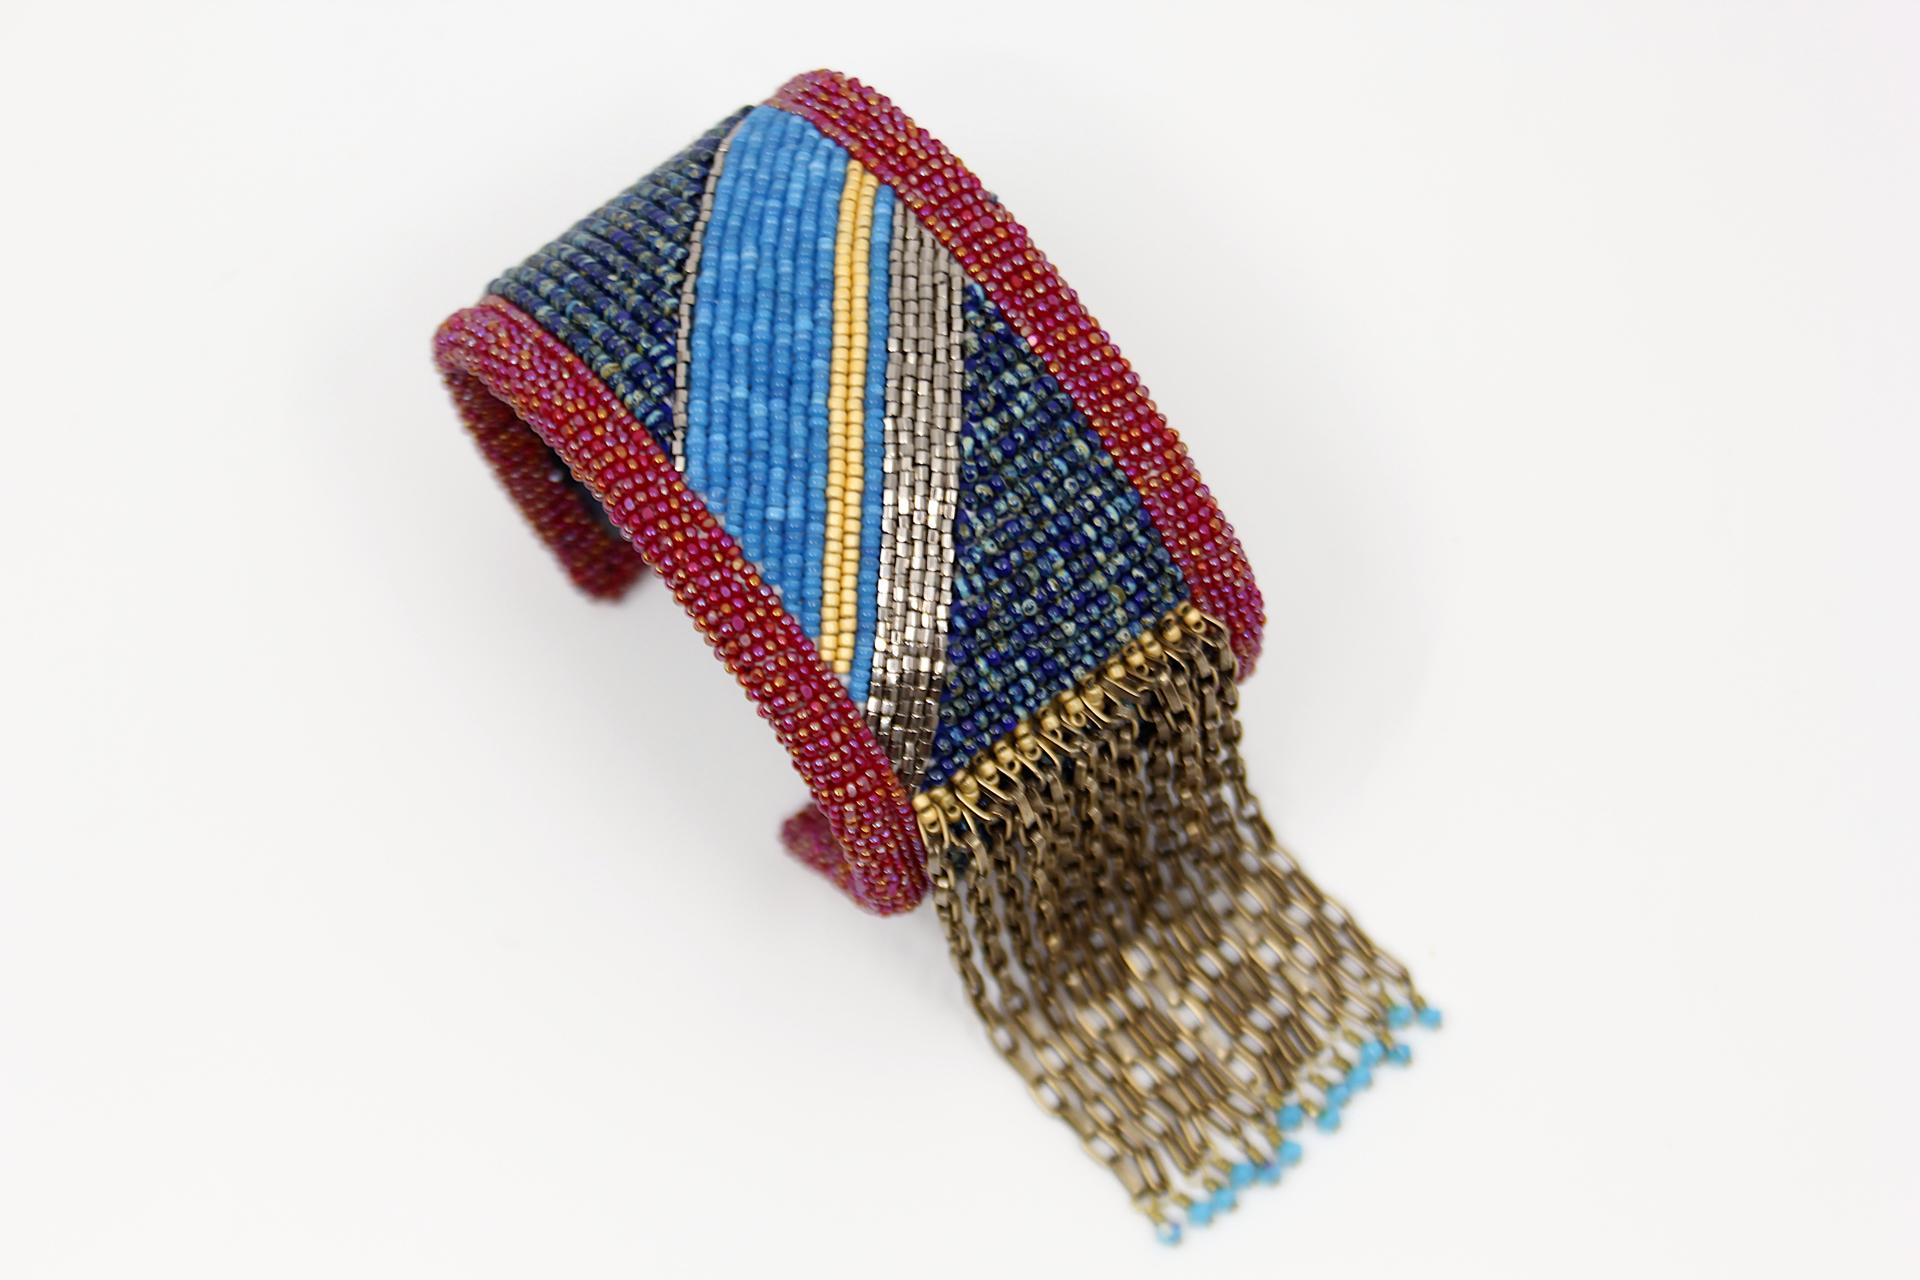 Bracelet by Hollis Chitto